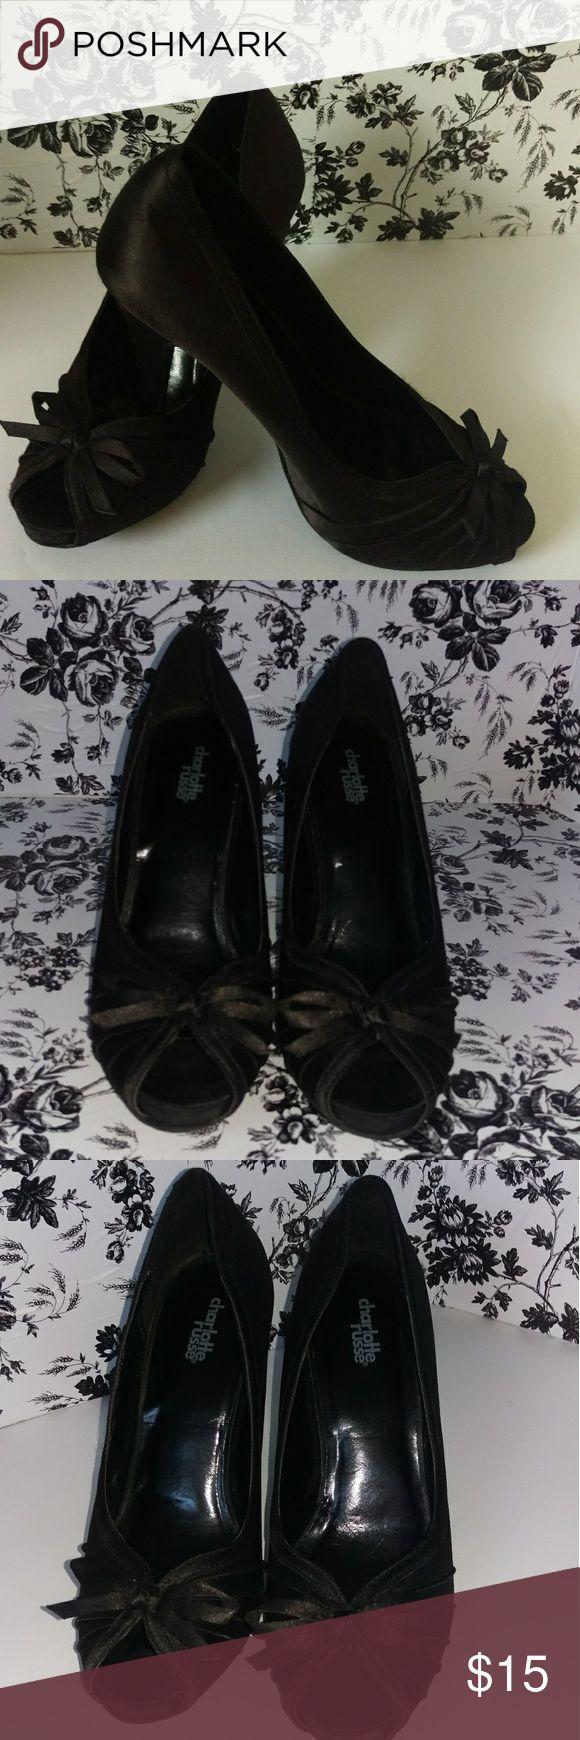 Women's Charlotte Rouse Black Peep Toe Heels Bow 9 Women's Charlotte Rouse Black Peep Toe Heels Bow Size 9 Charlotte Russe Shoes